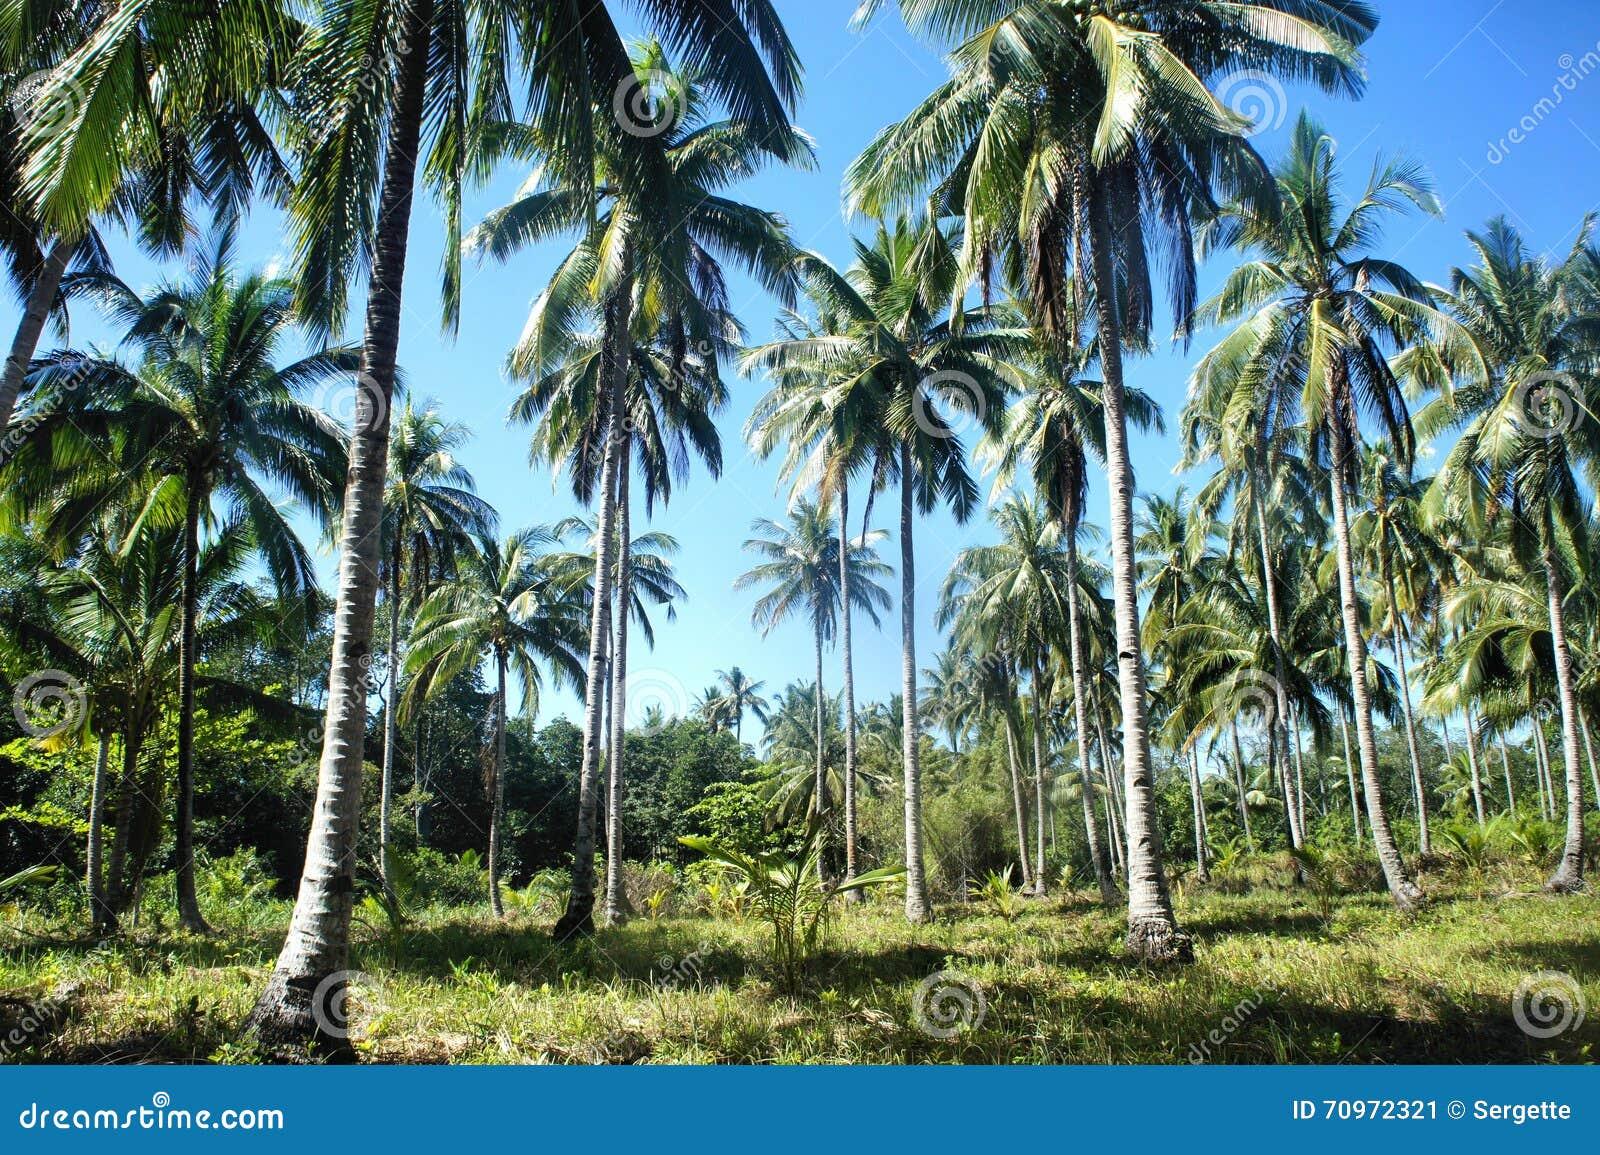 Tropical Landscape . Farm Of Coconut Trees . Stock Image